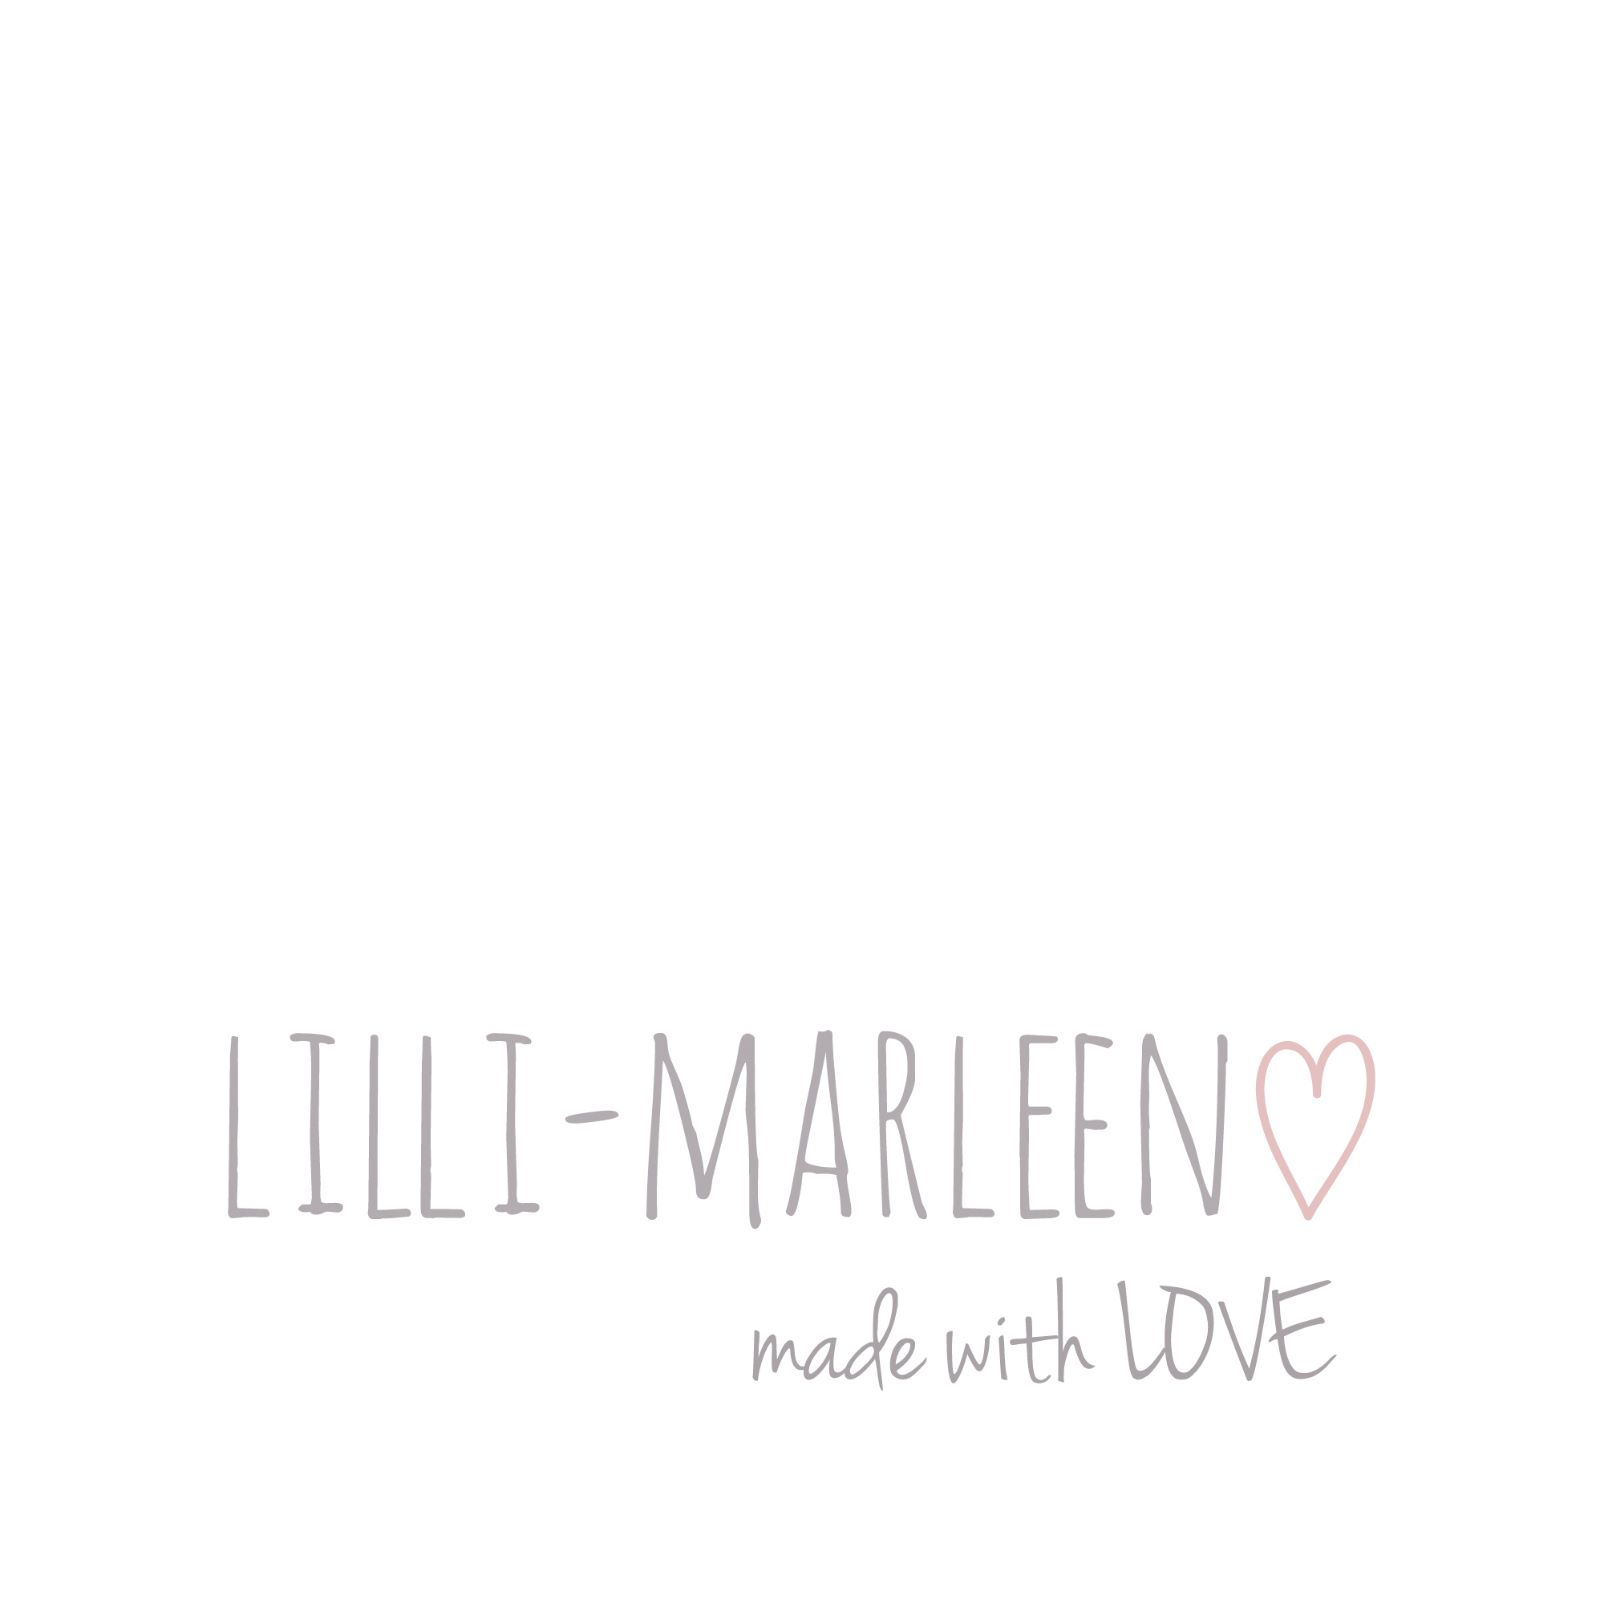 Lilli-Marleen. handmade with LOVE